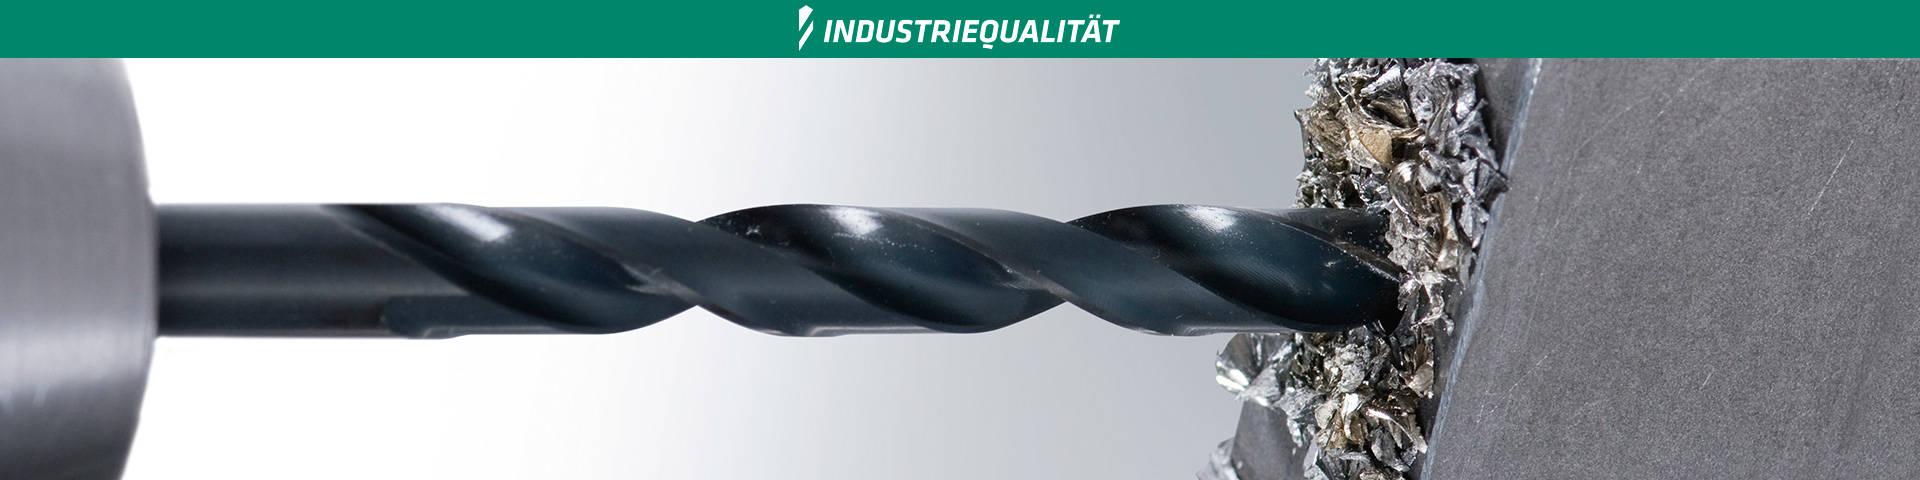 Alpen 615700900100 DIN 338 K20 TIALN 9,0mm Solid carbide jobber drills